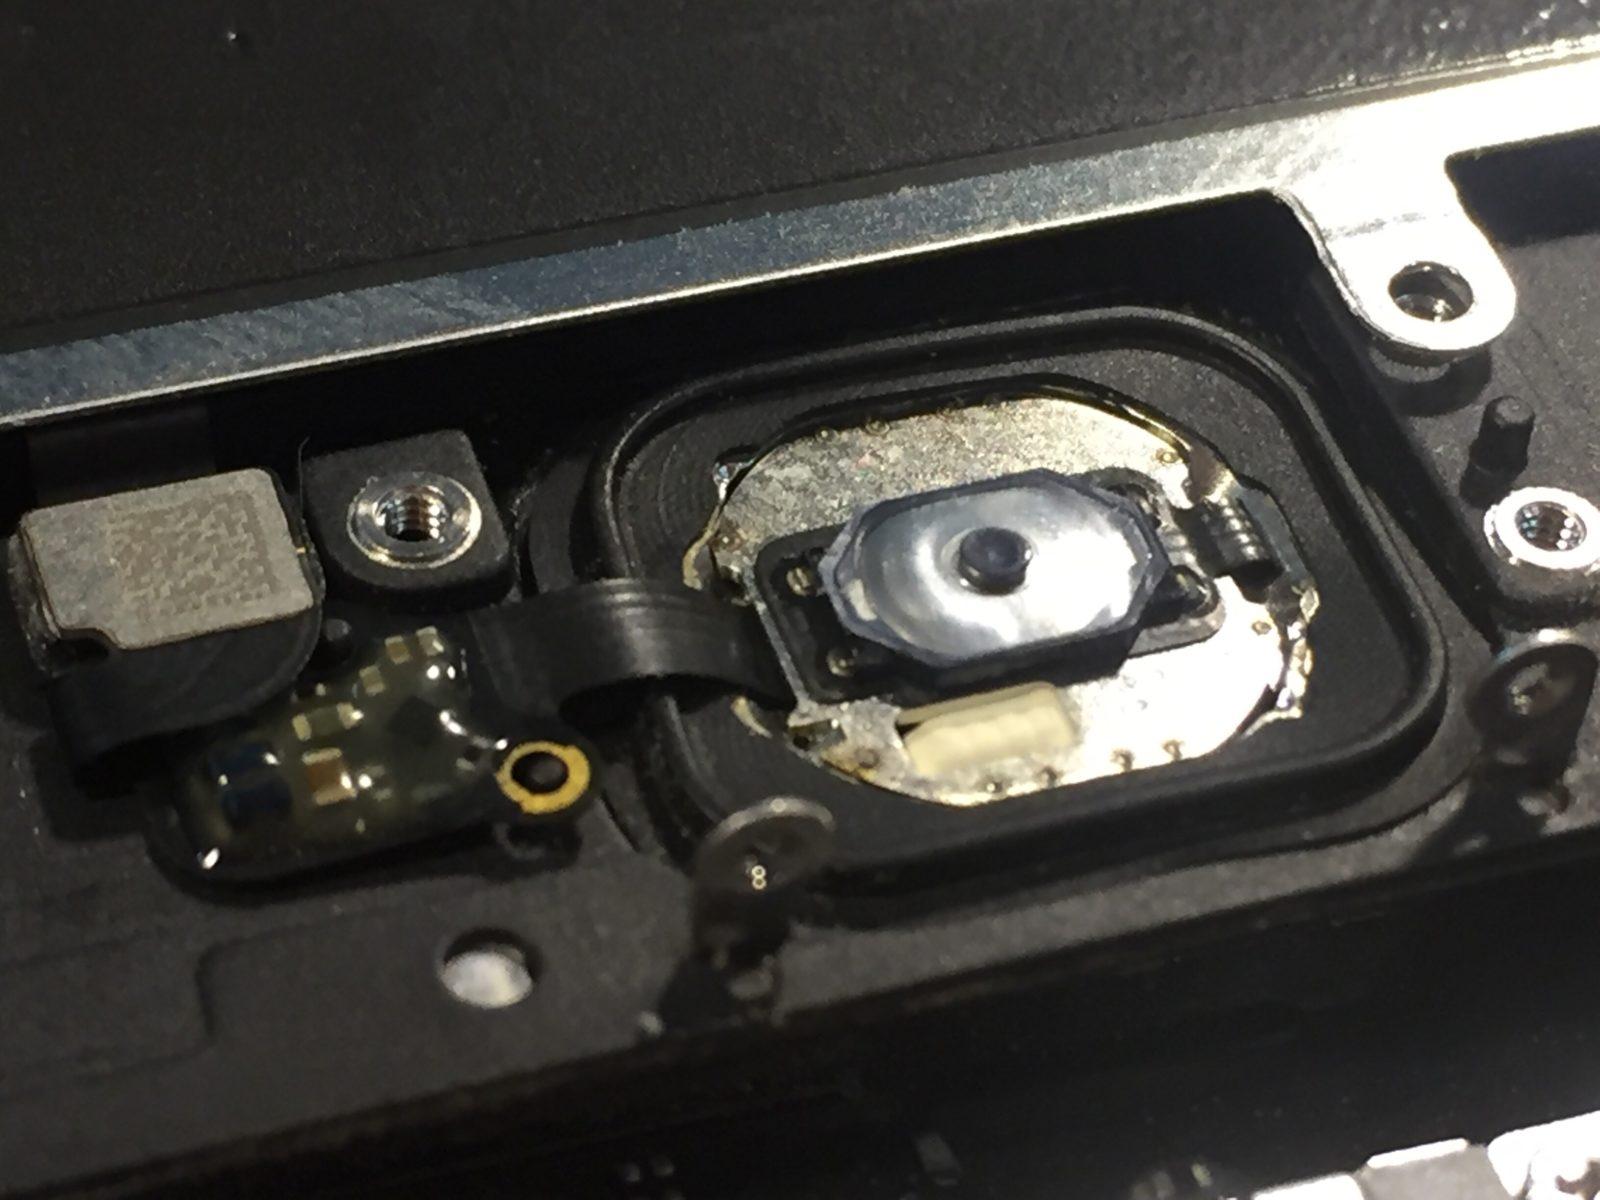 Не работает кнопка Home на iPhone 6, 6s (plus) - прощайтесь с Touch ID